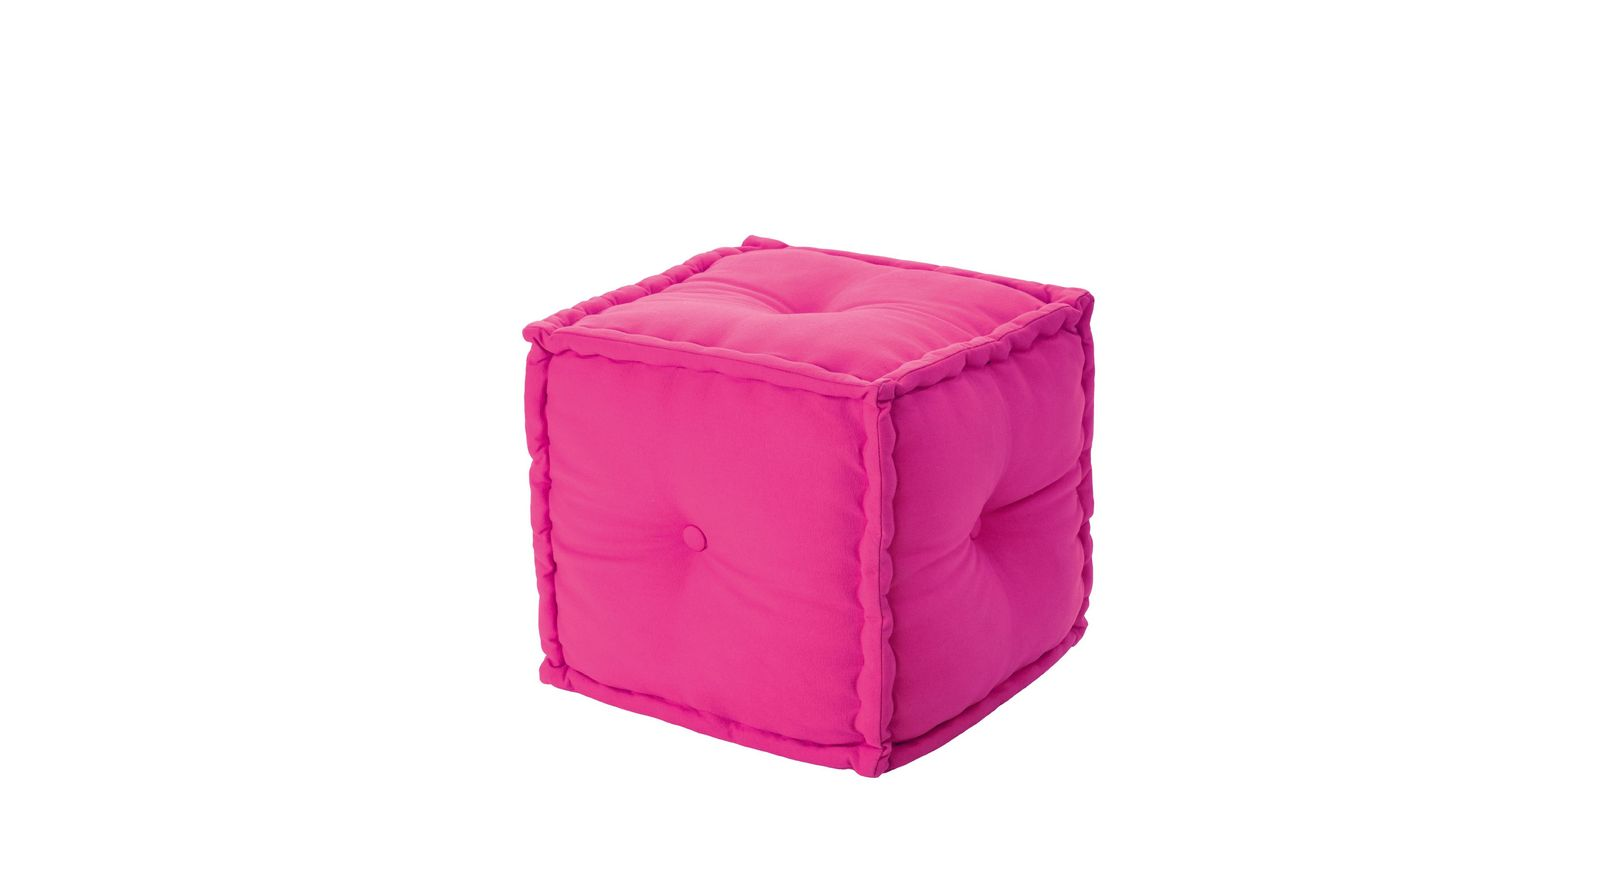 Sitzkissen-Sofa Kids Paradises pinkfarbener Sitzwürfel